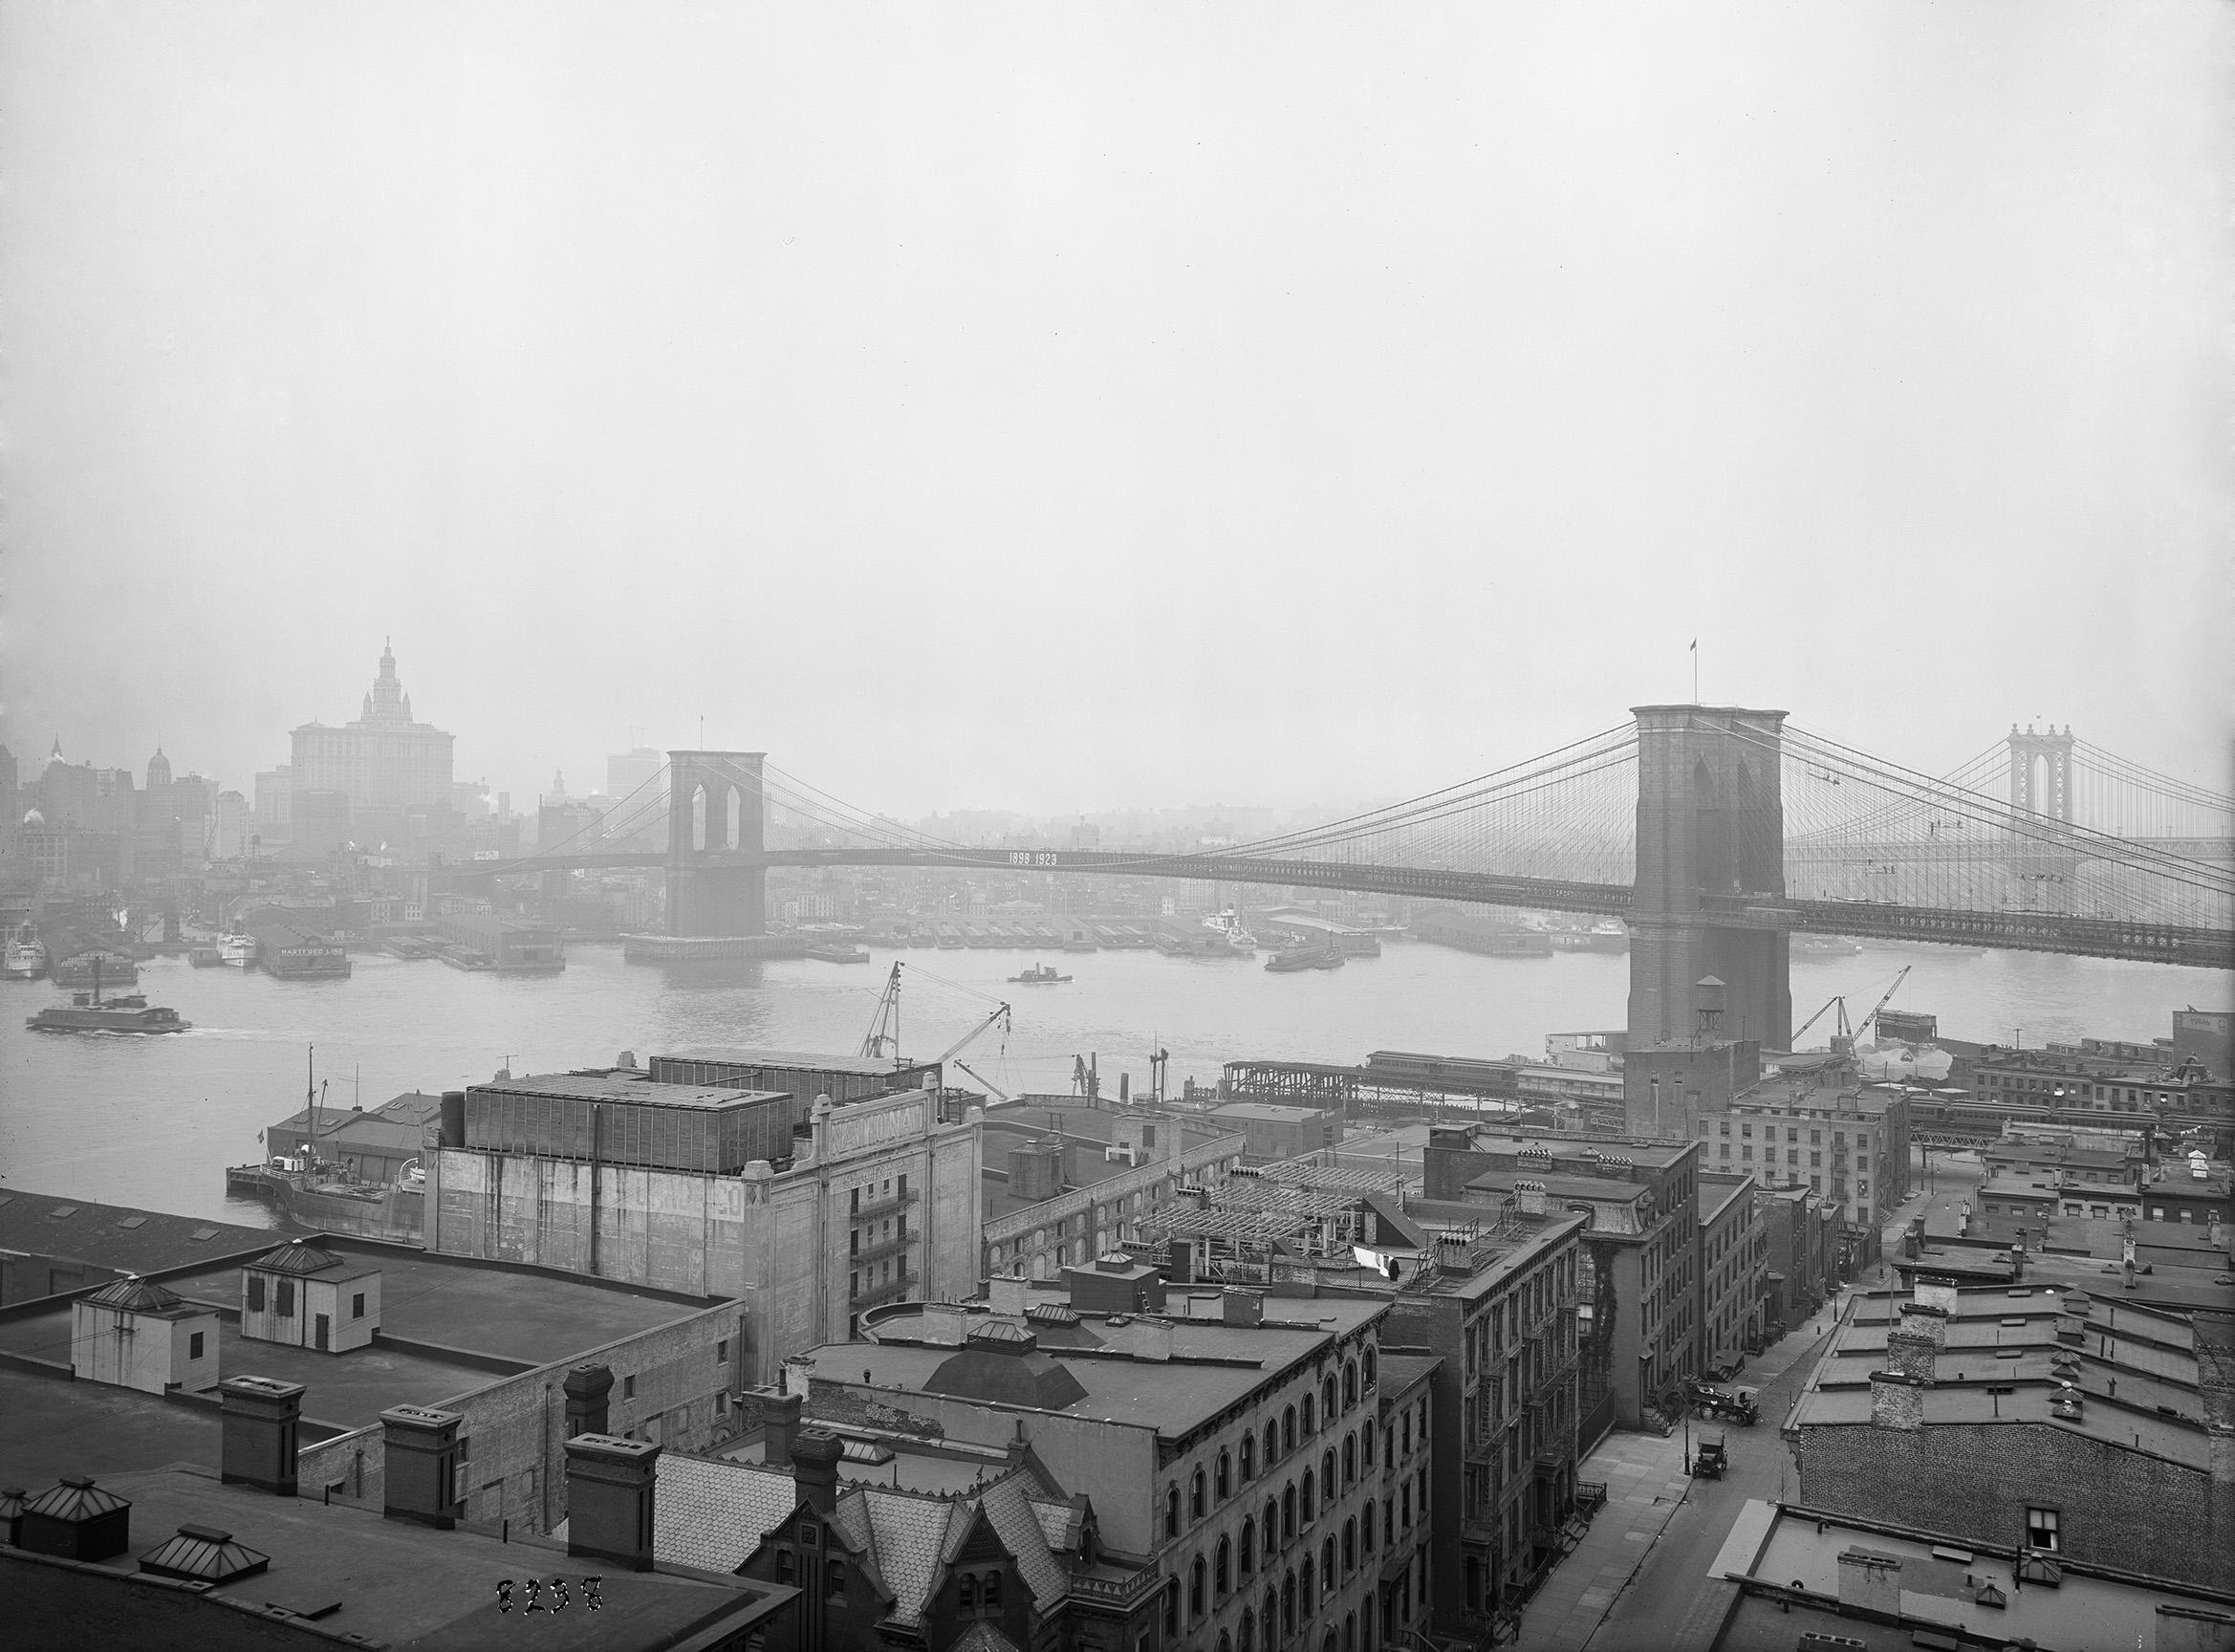 Brooklyn Bridge view from Hotel Margaret, Eugene de Salignac, June 12, 1923